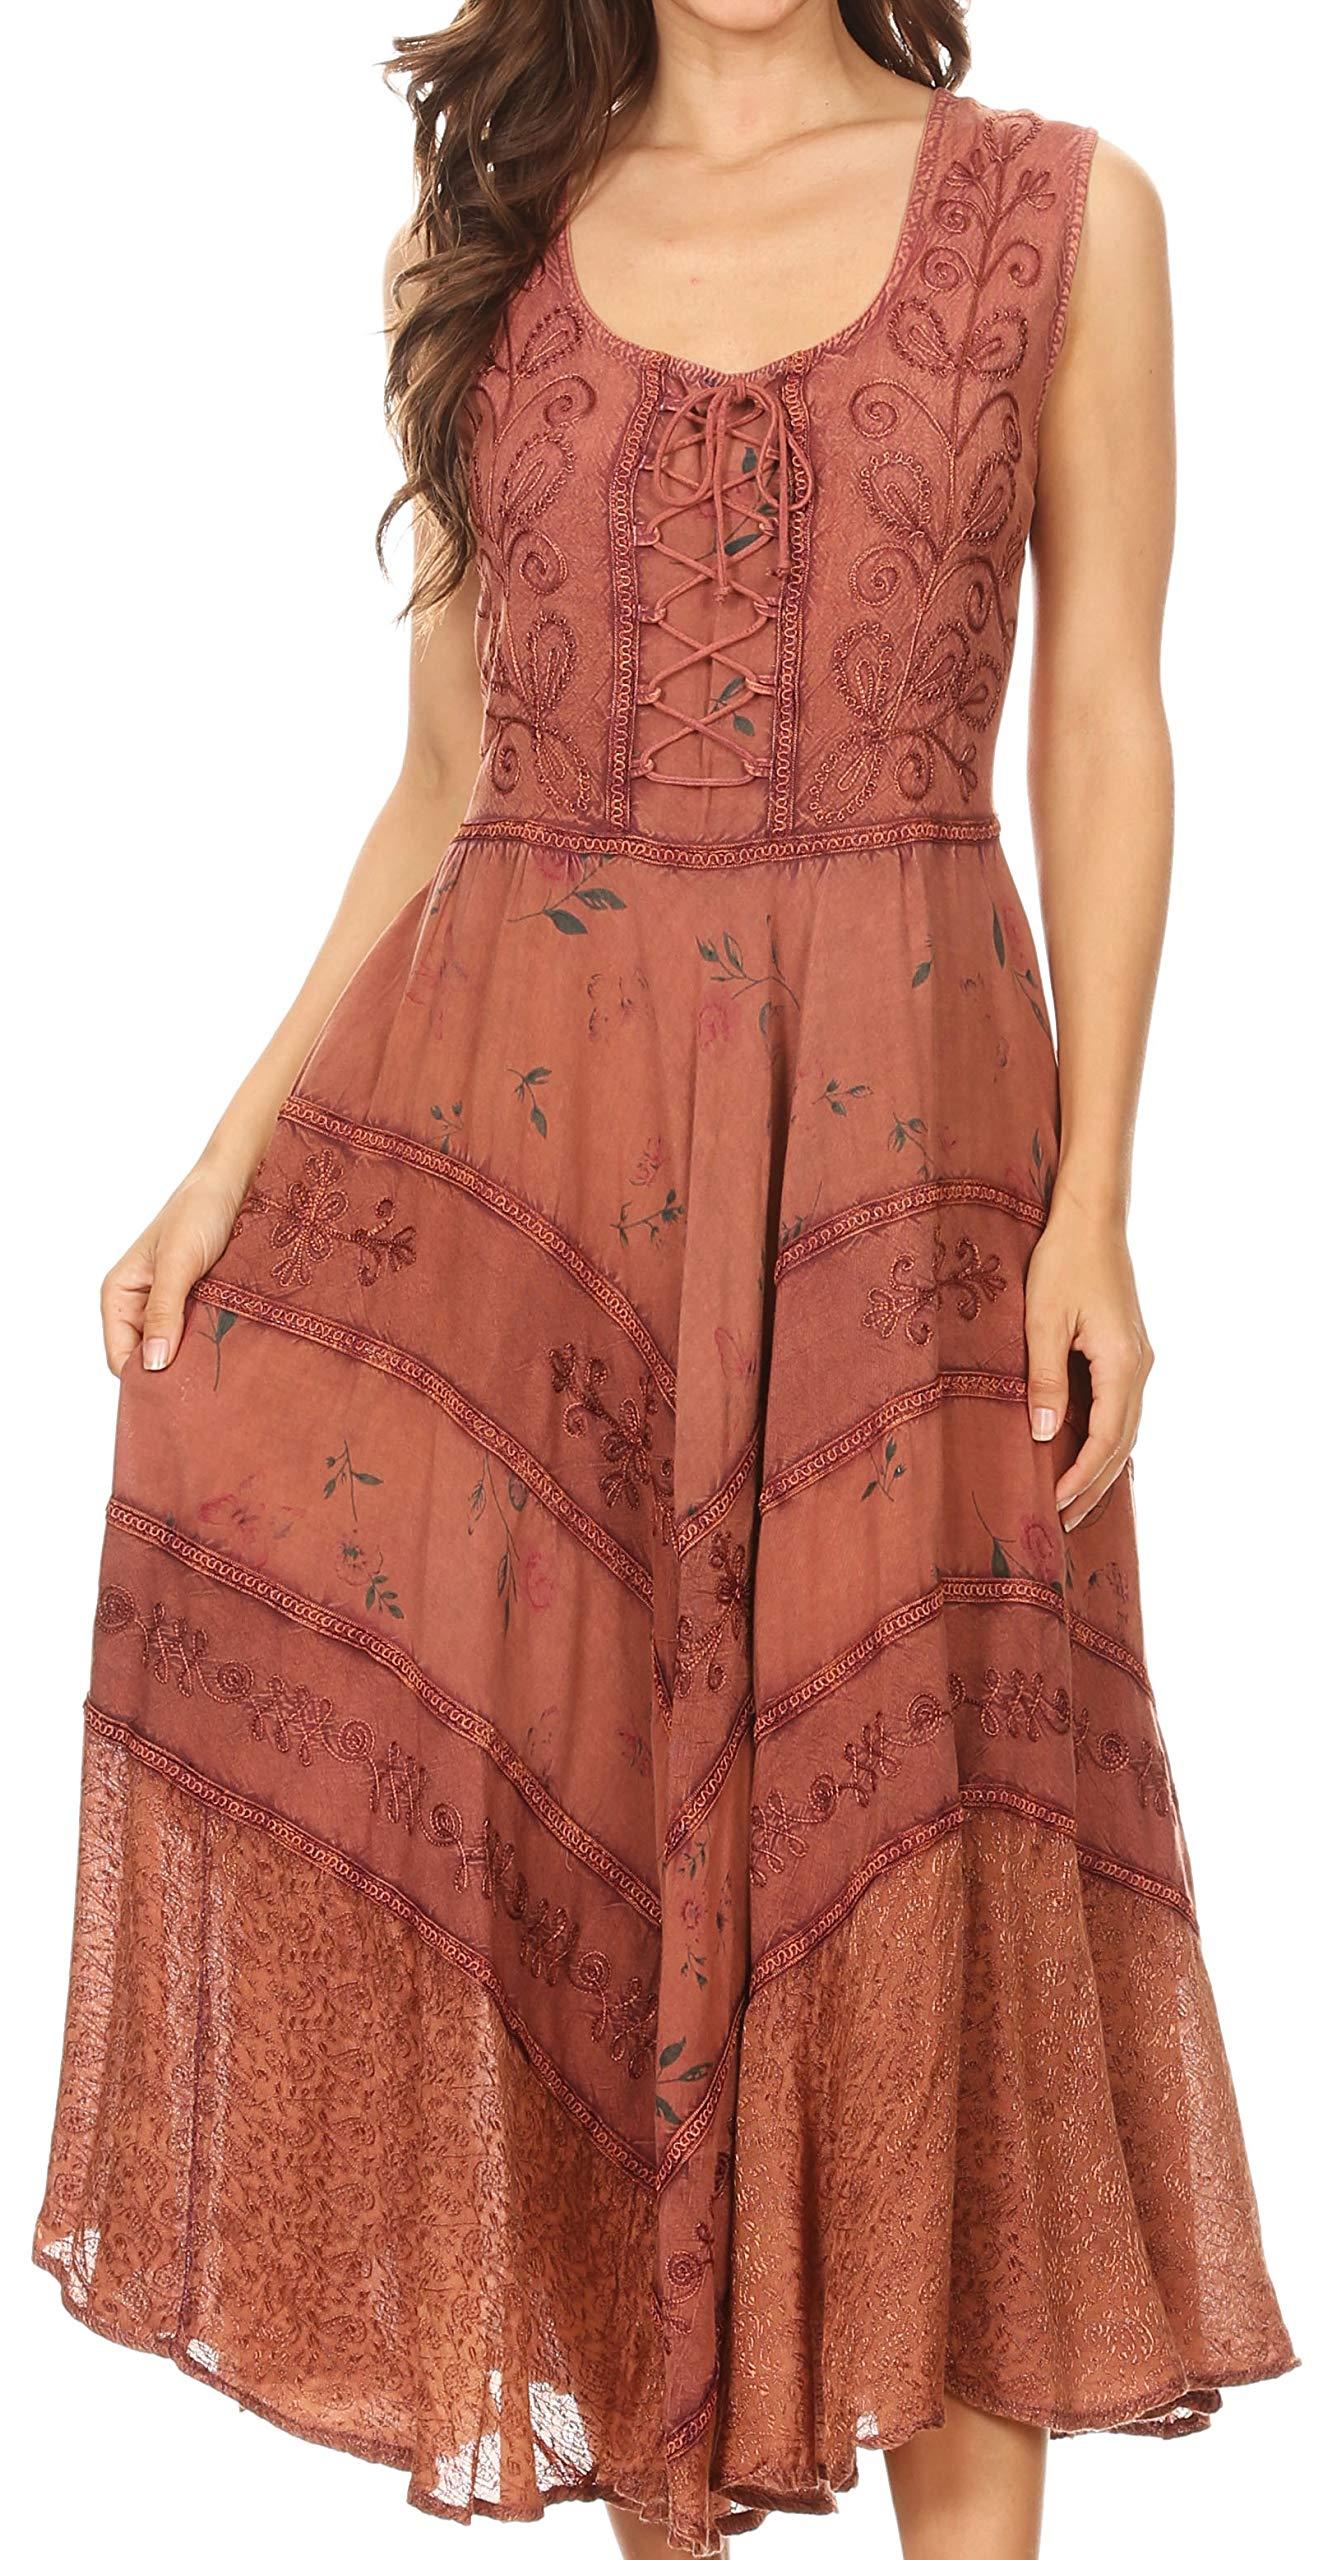 Sakkas 22311 Garden Goddess Corset Style Dress - Rose - L/XL by Sakkas